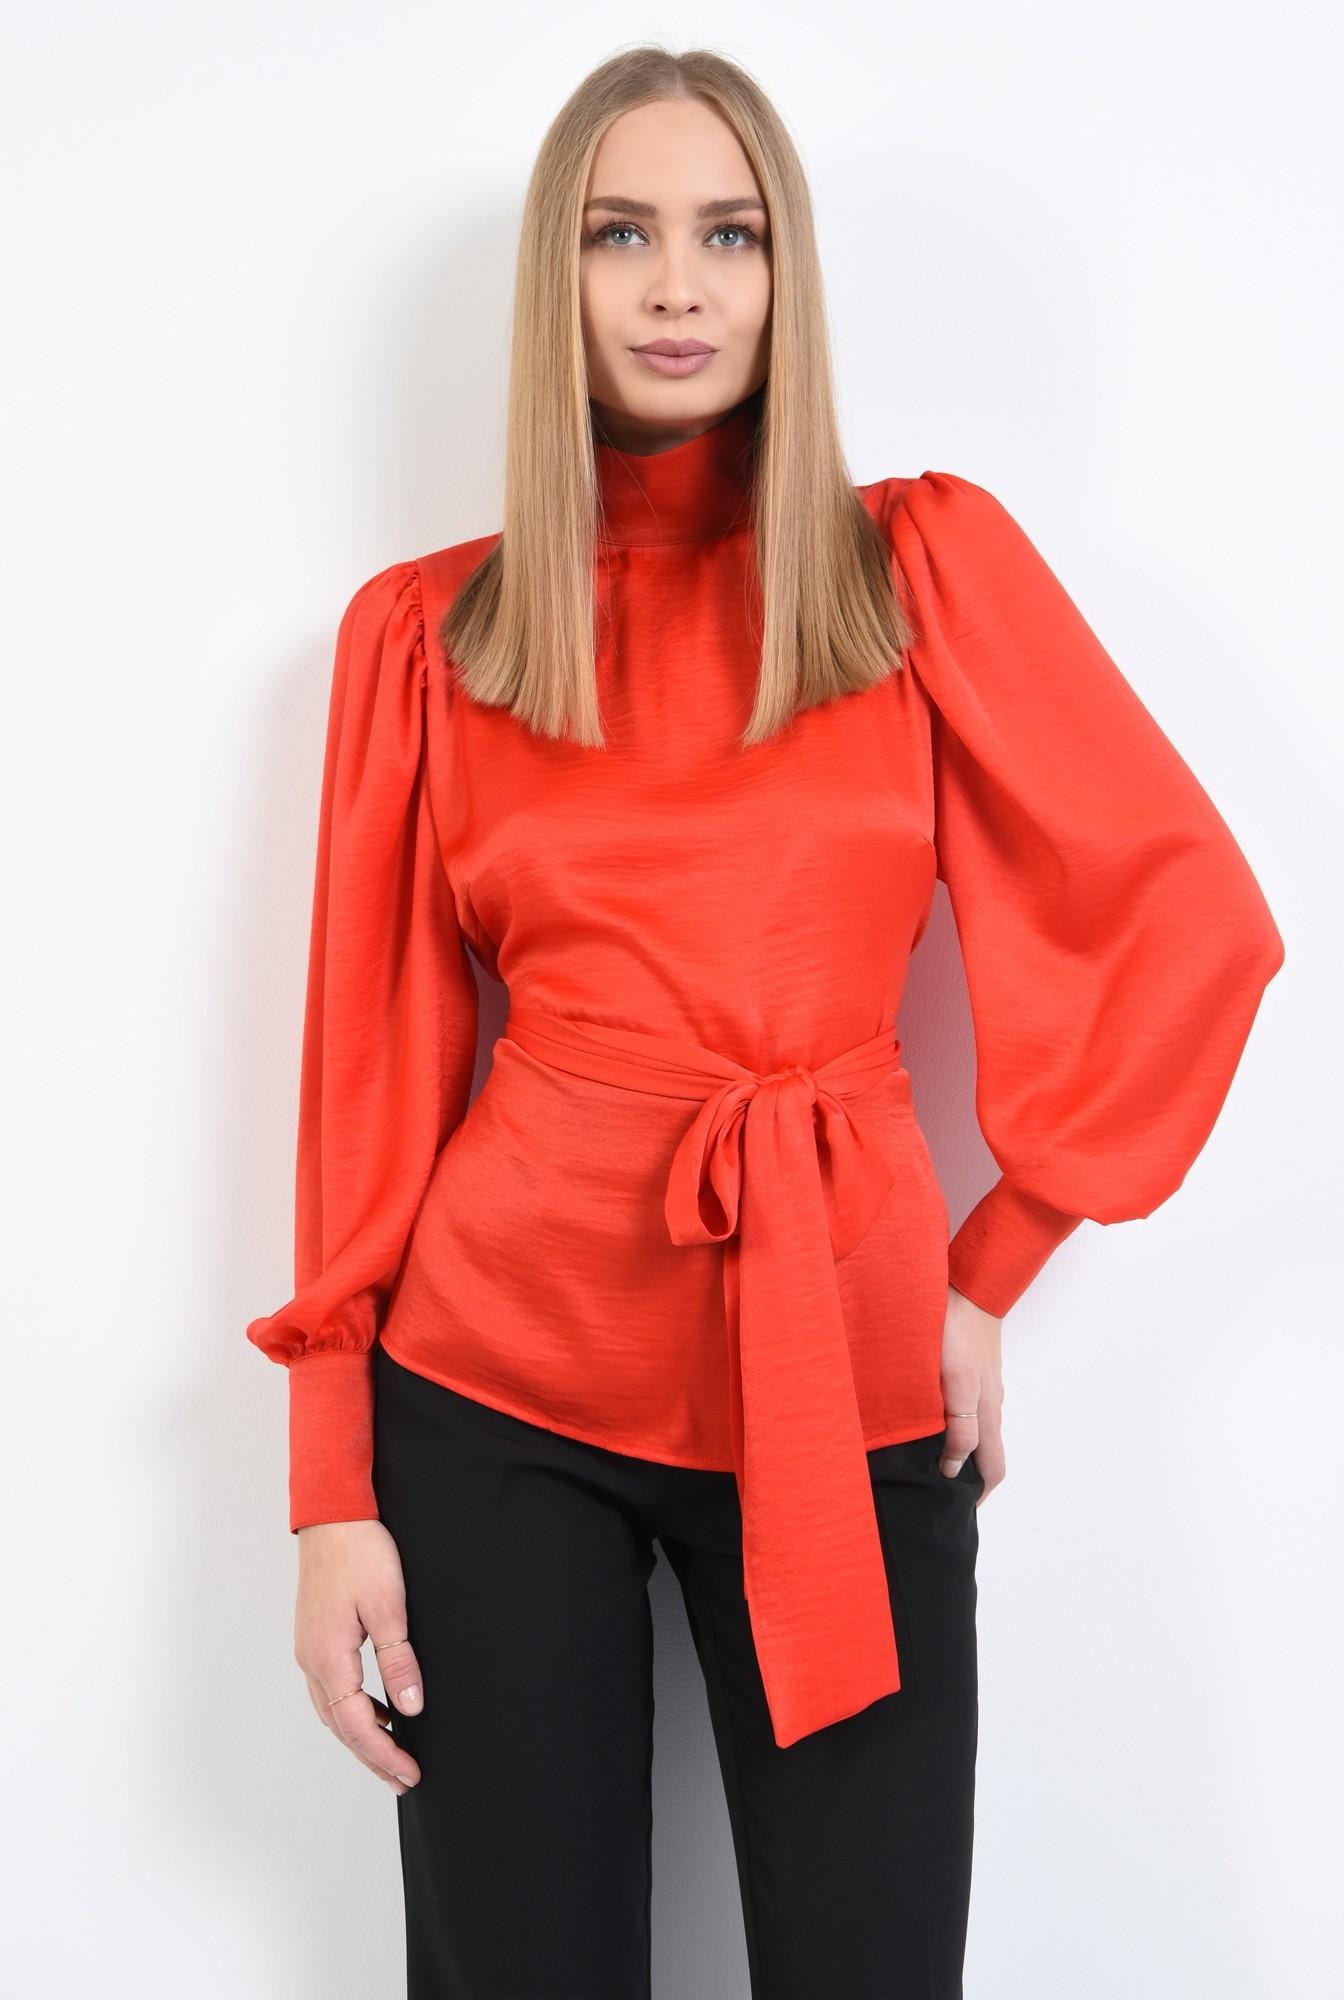 0 - 360 - bluza de ocazie, rosu, cu funda, cu maneci lungi